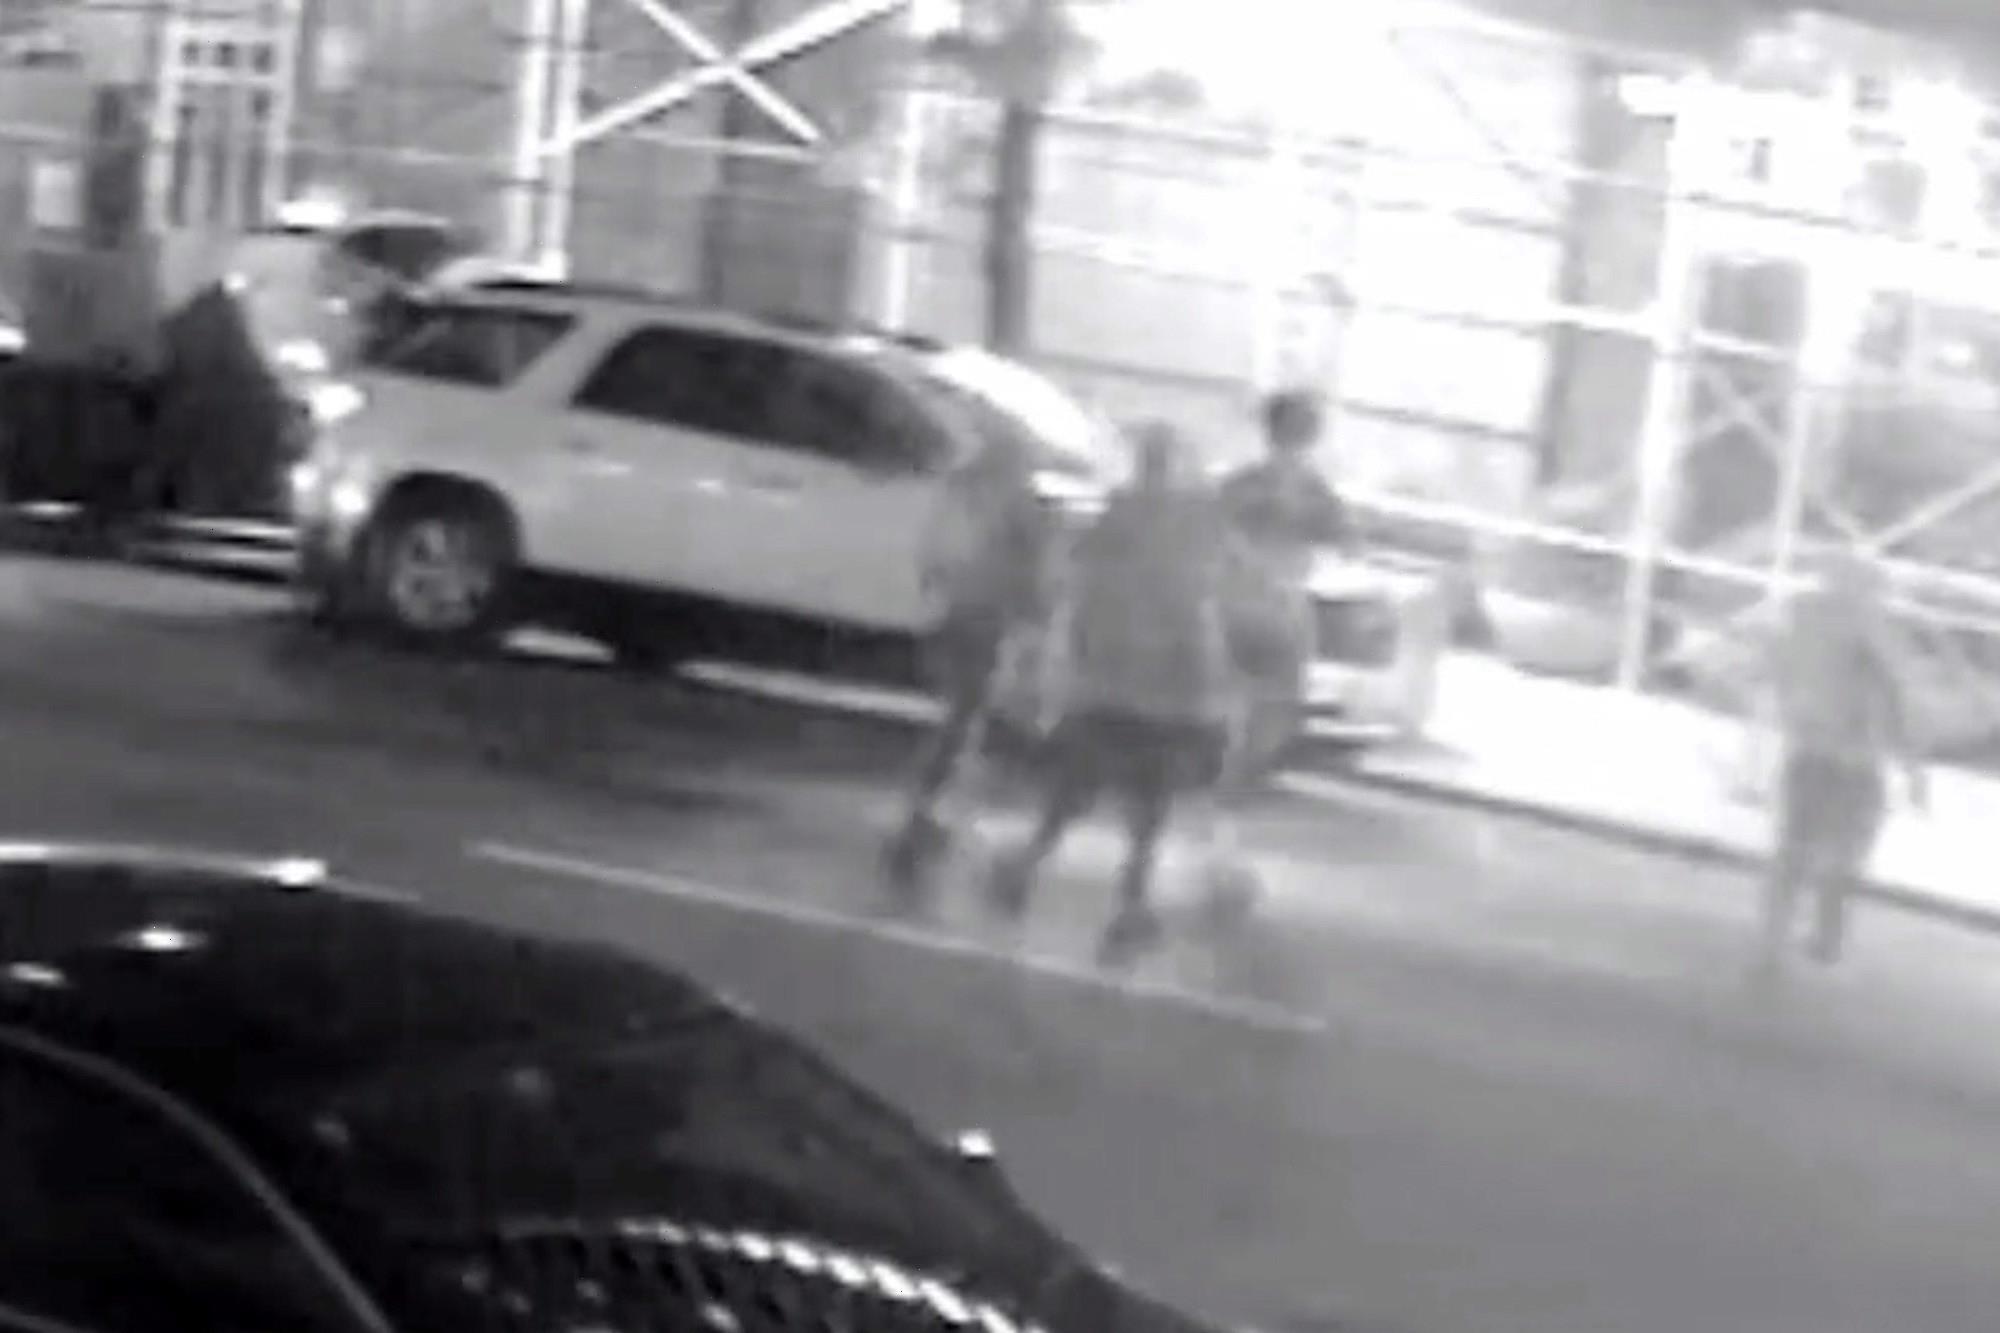 Hells Kitchen carjackers drag woman several feet, video shows